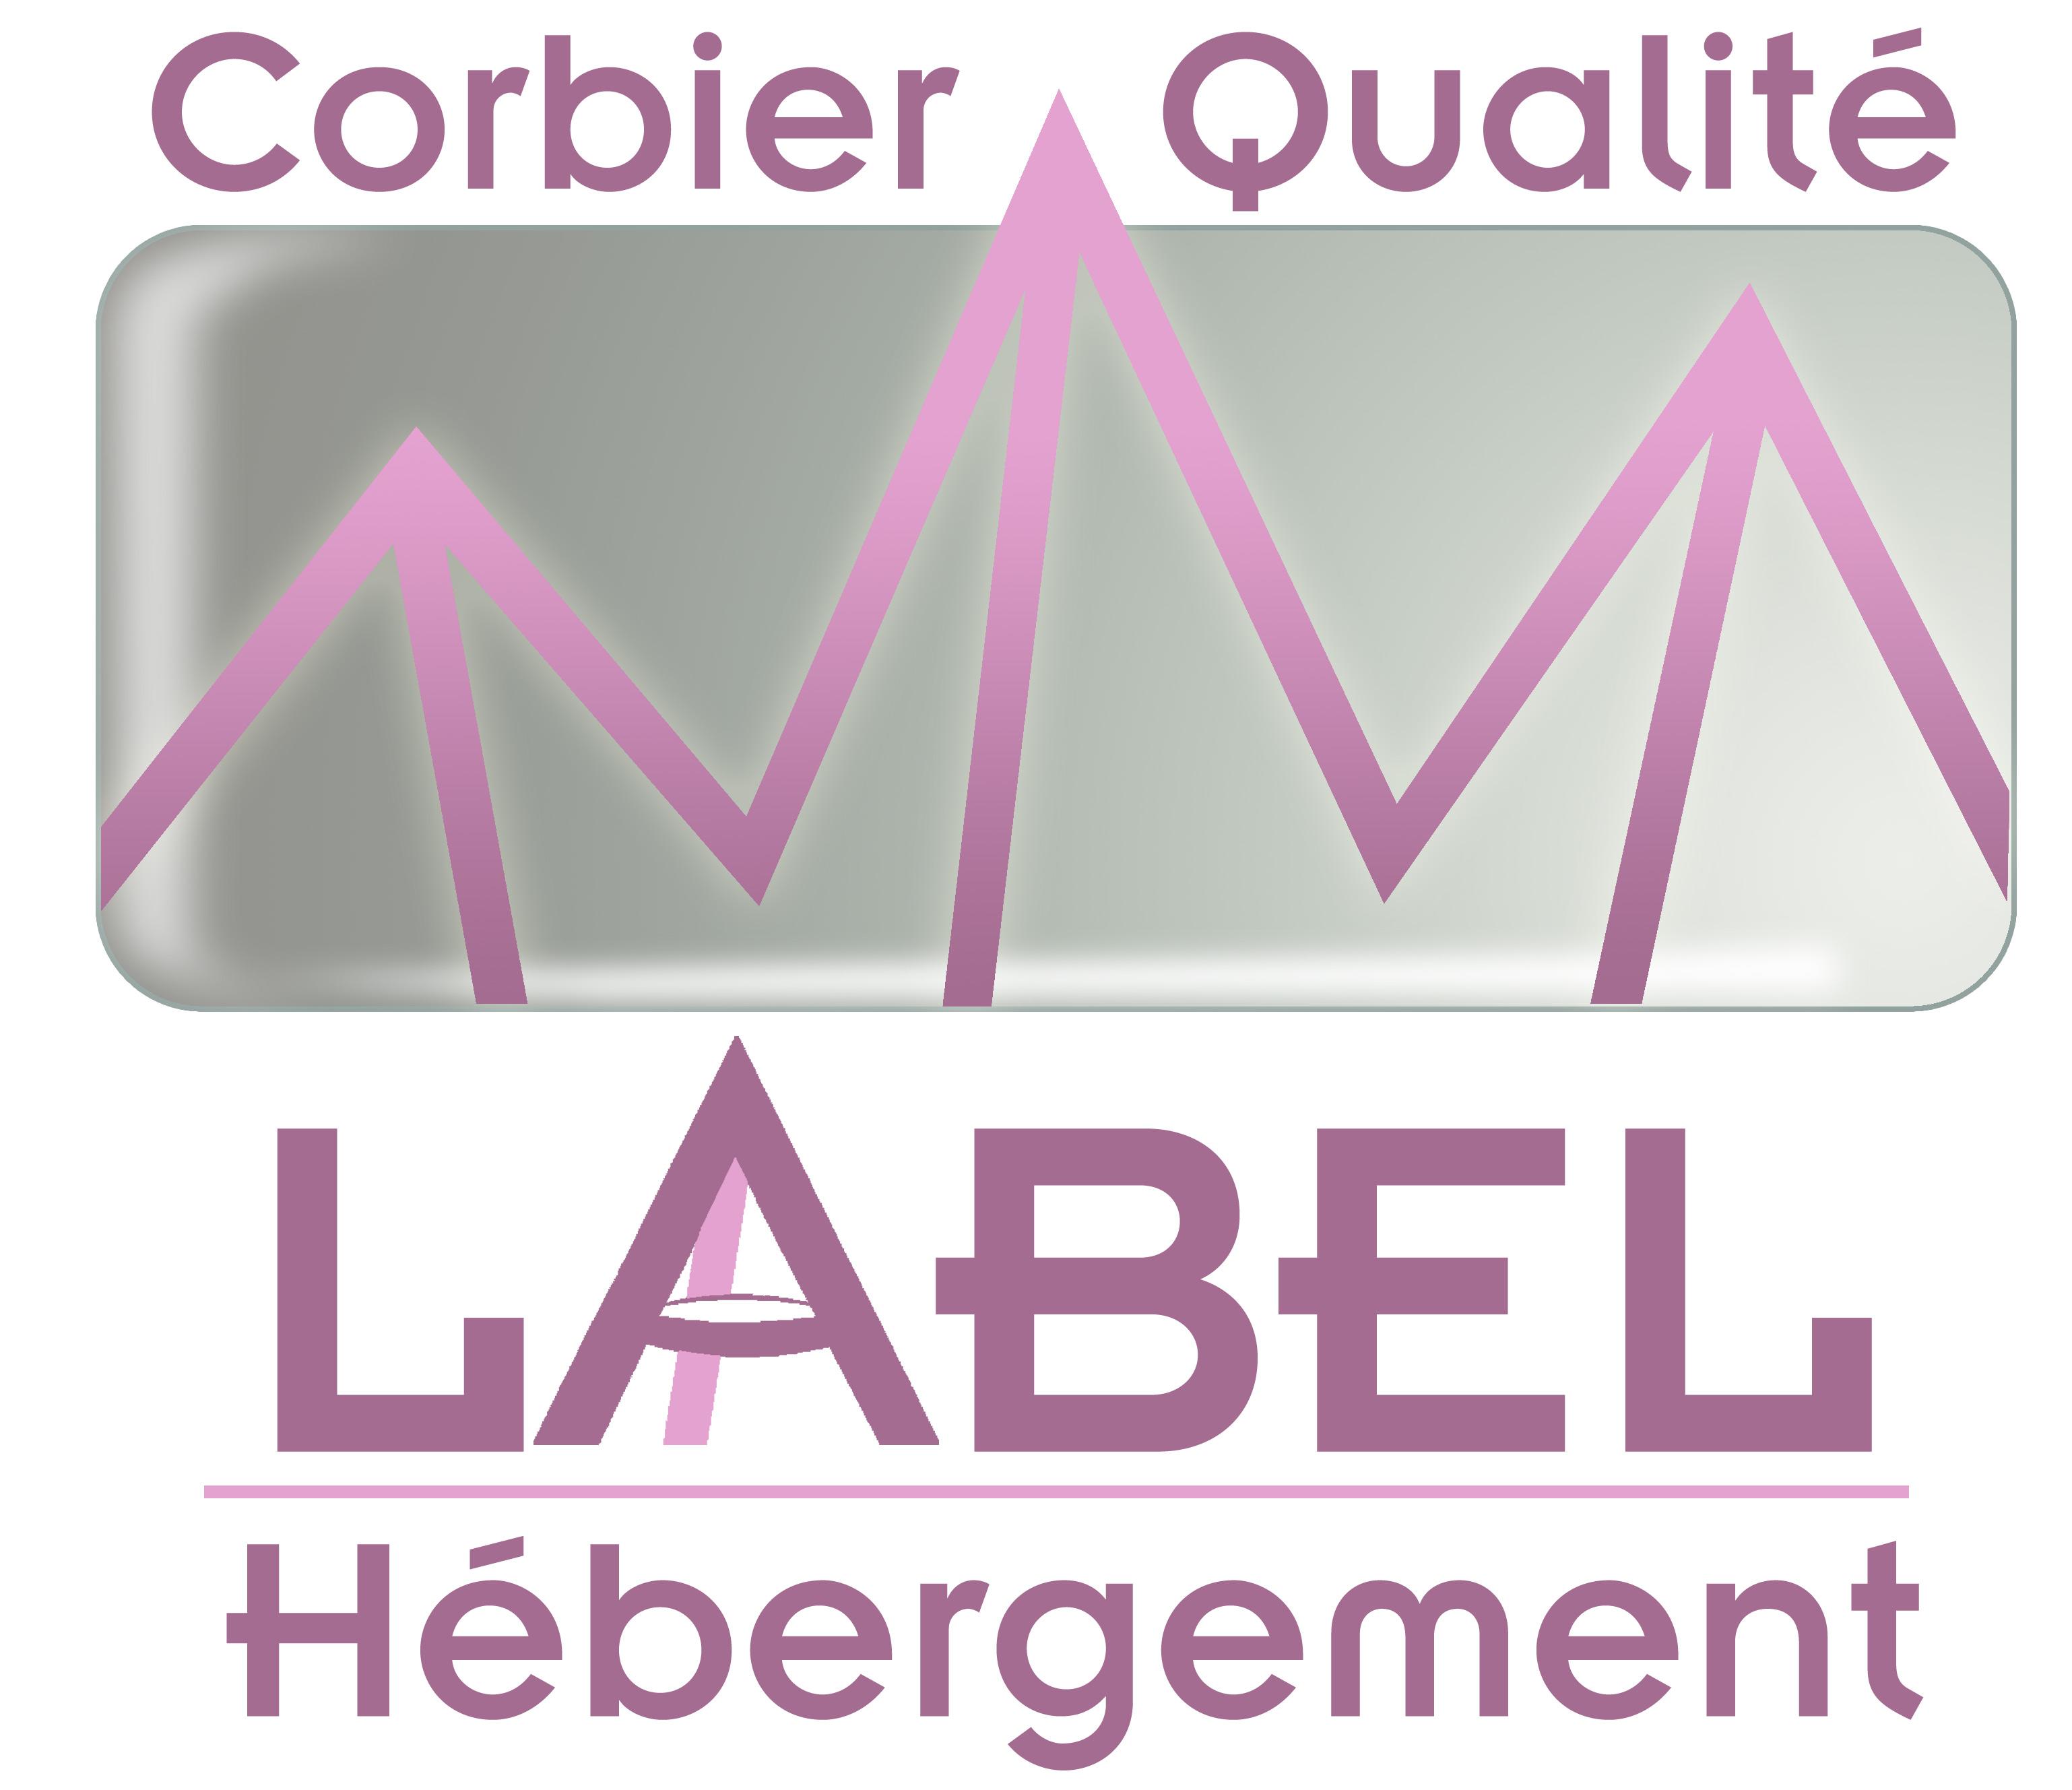 QUALITE CORBIER HEBERGEMENT